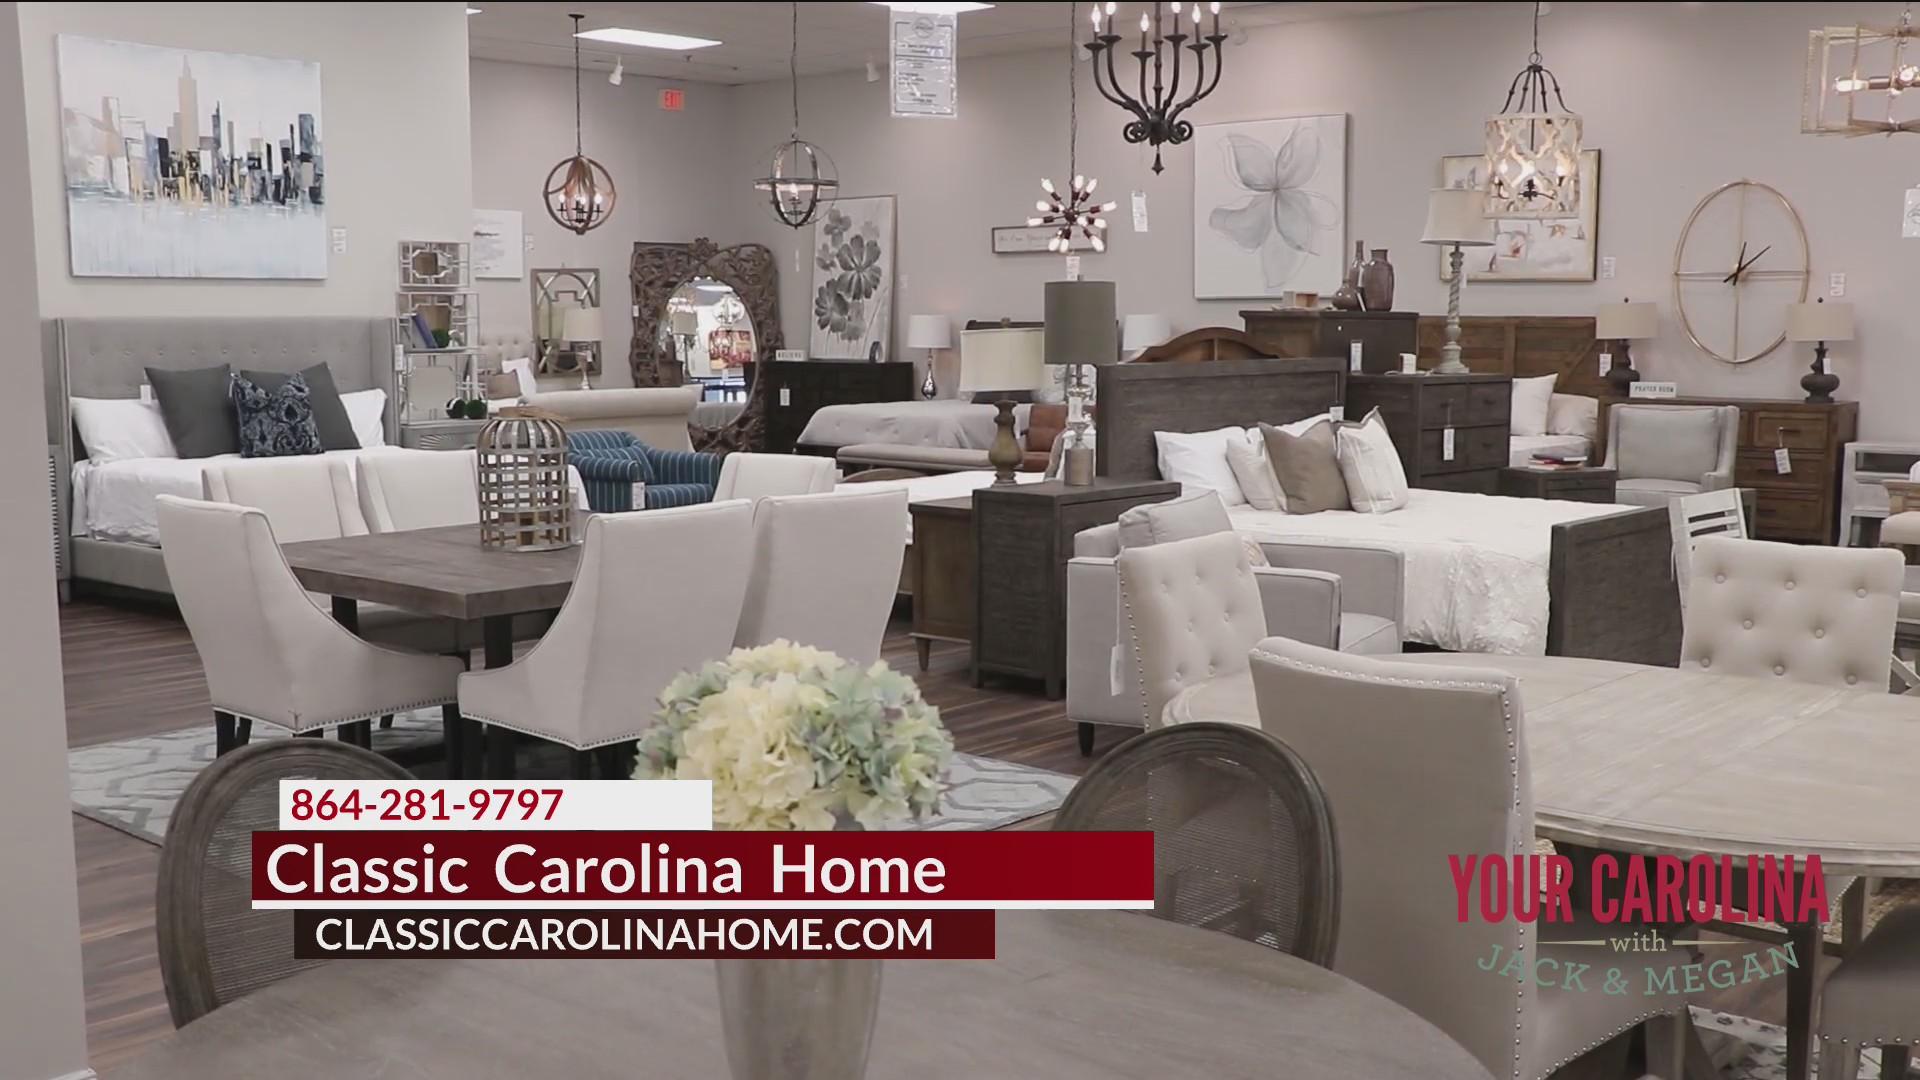 Classic Carolina Home